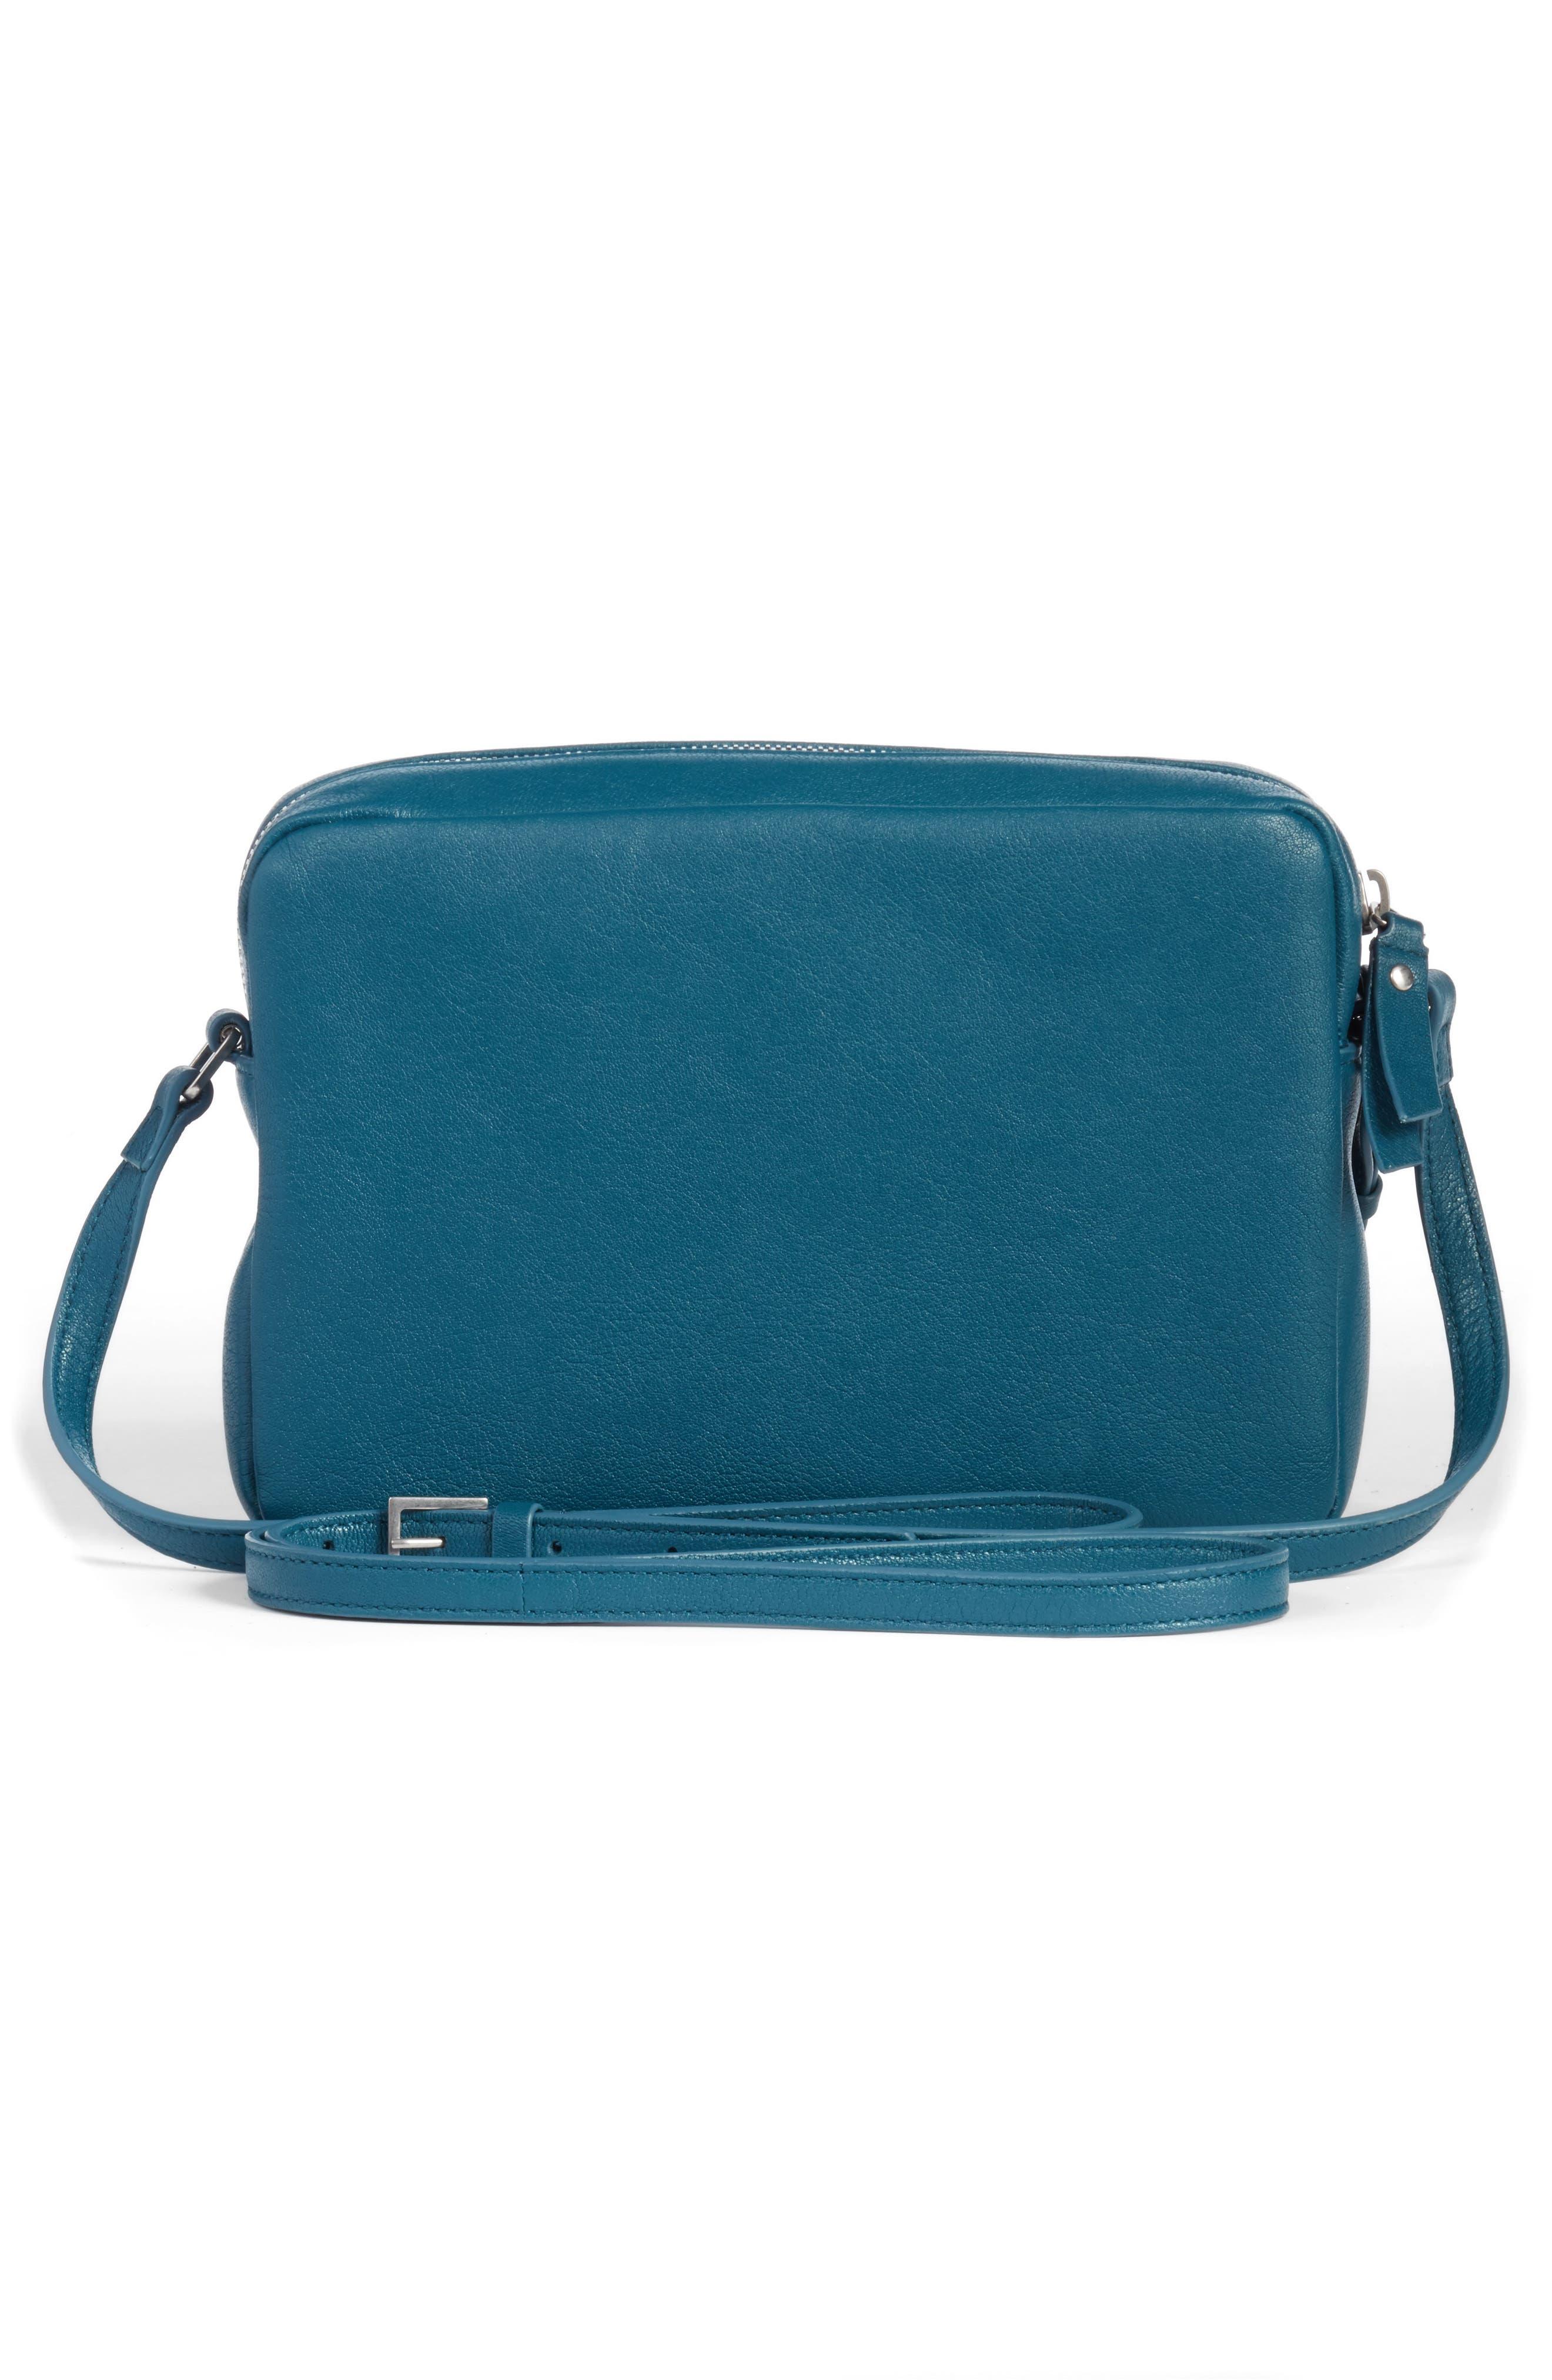 Alternate Image 2  - Saint Laurent Small Mono Leather Camera Bag